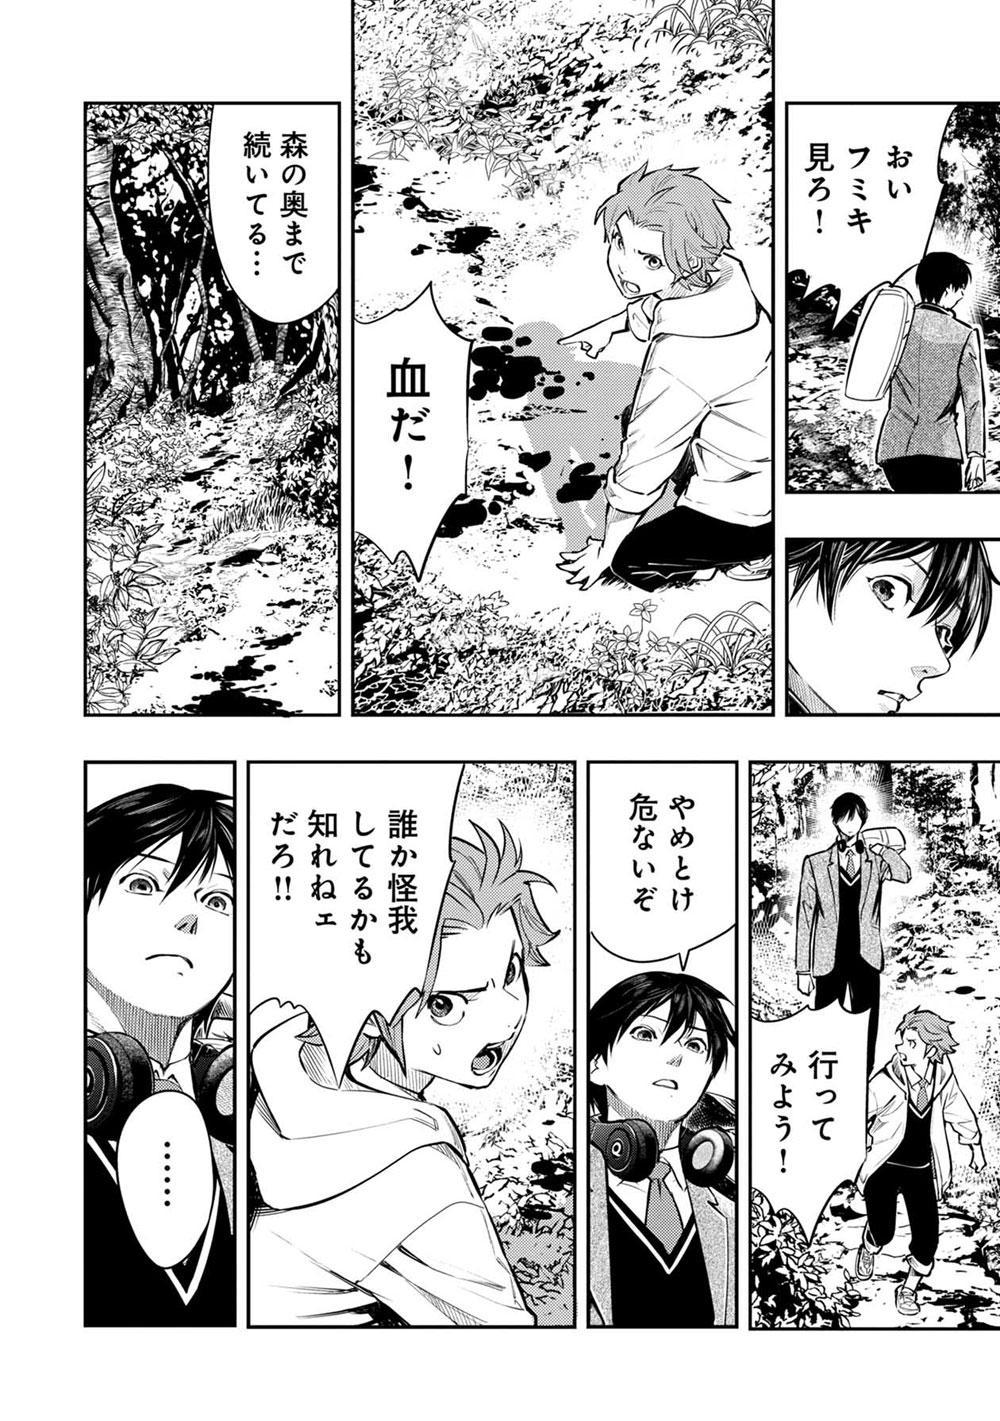 inugami_re_002_009.jpg